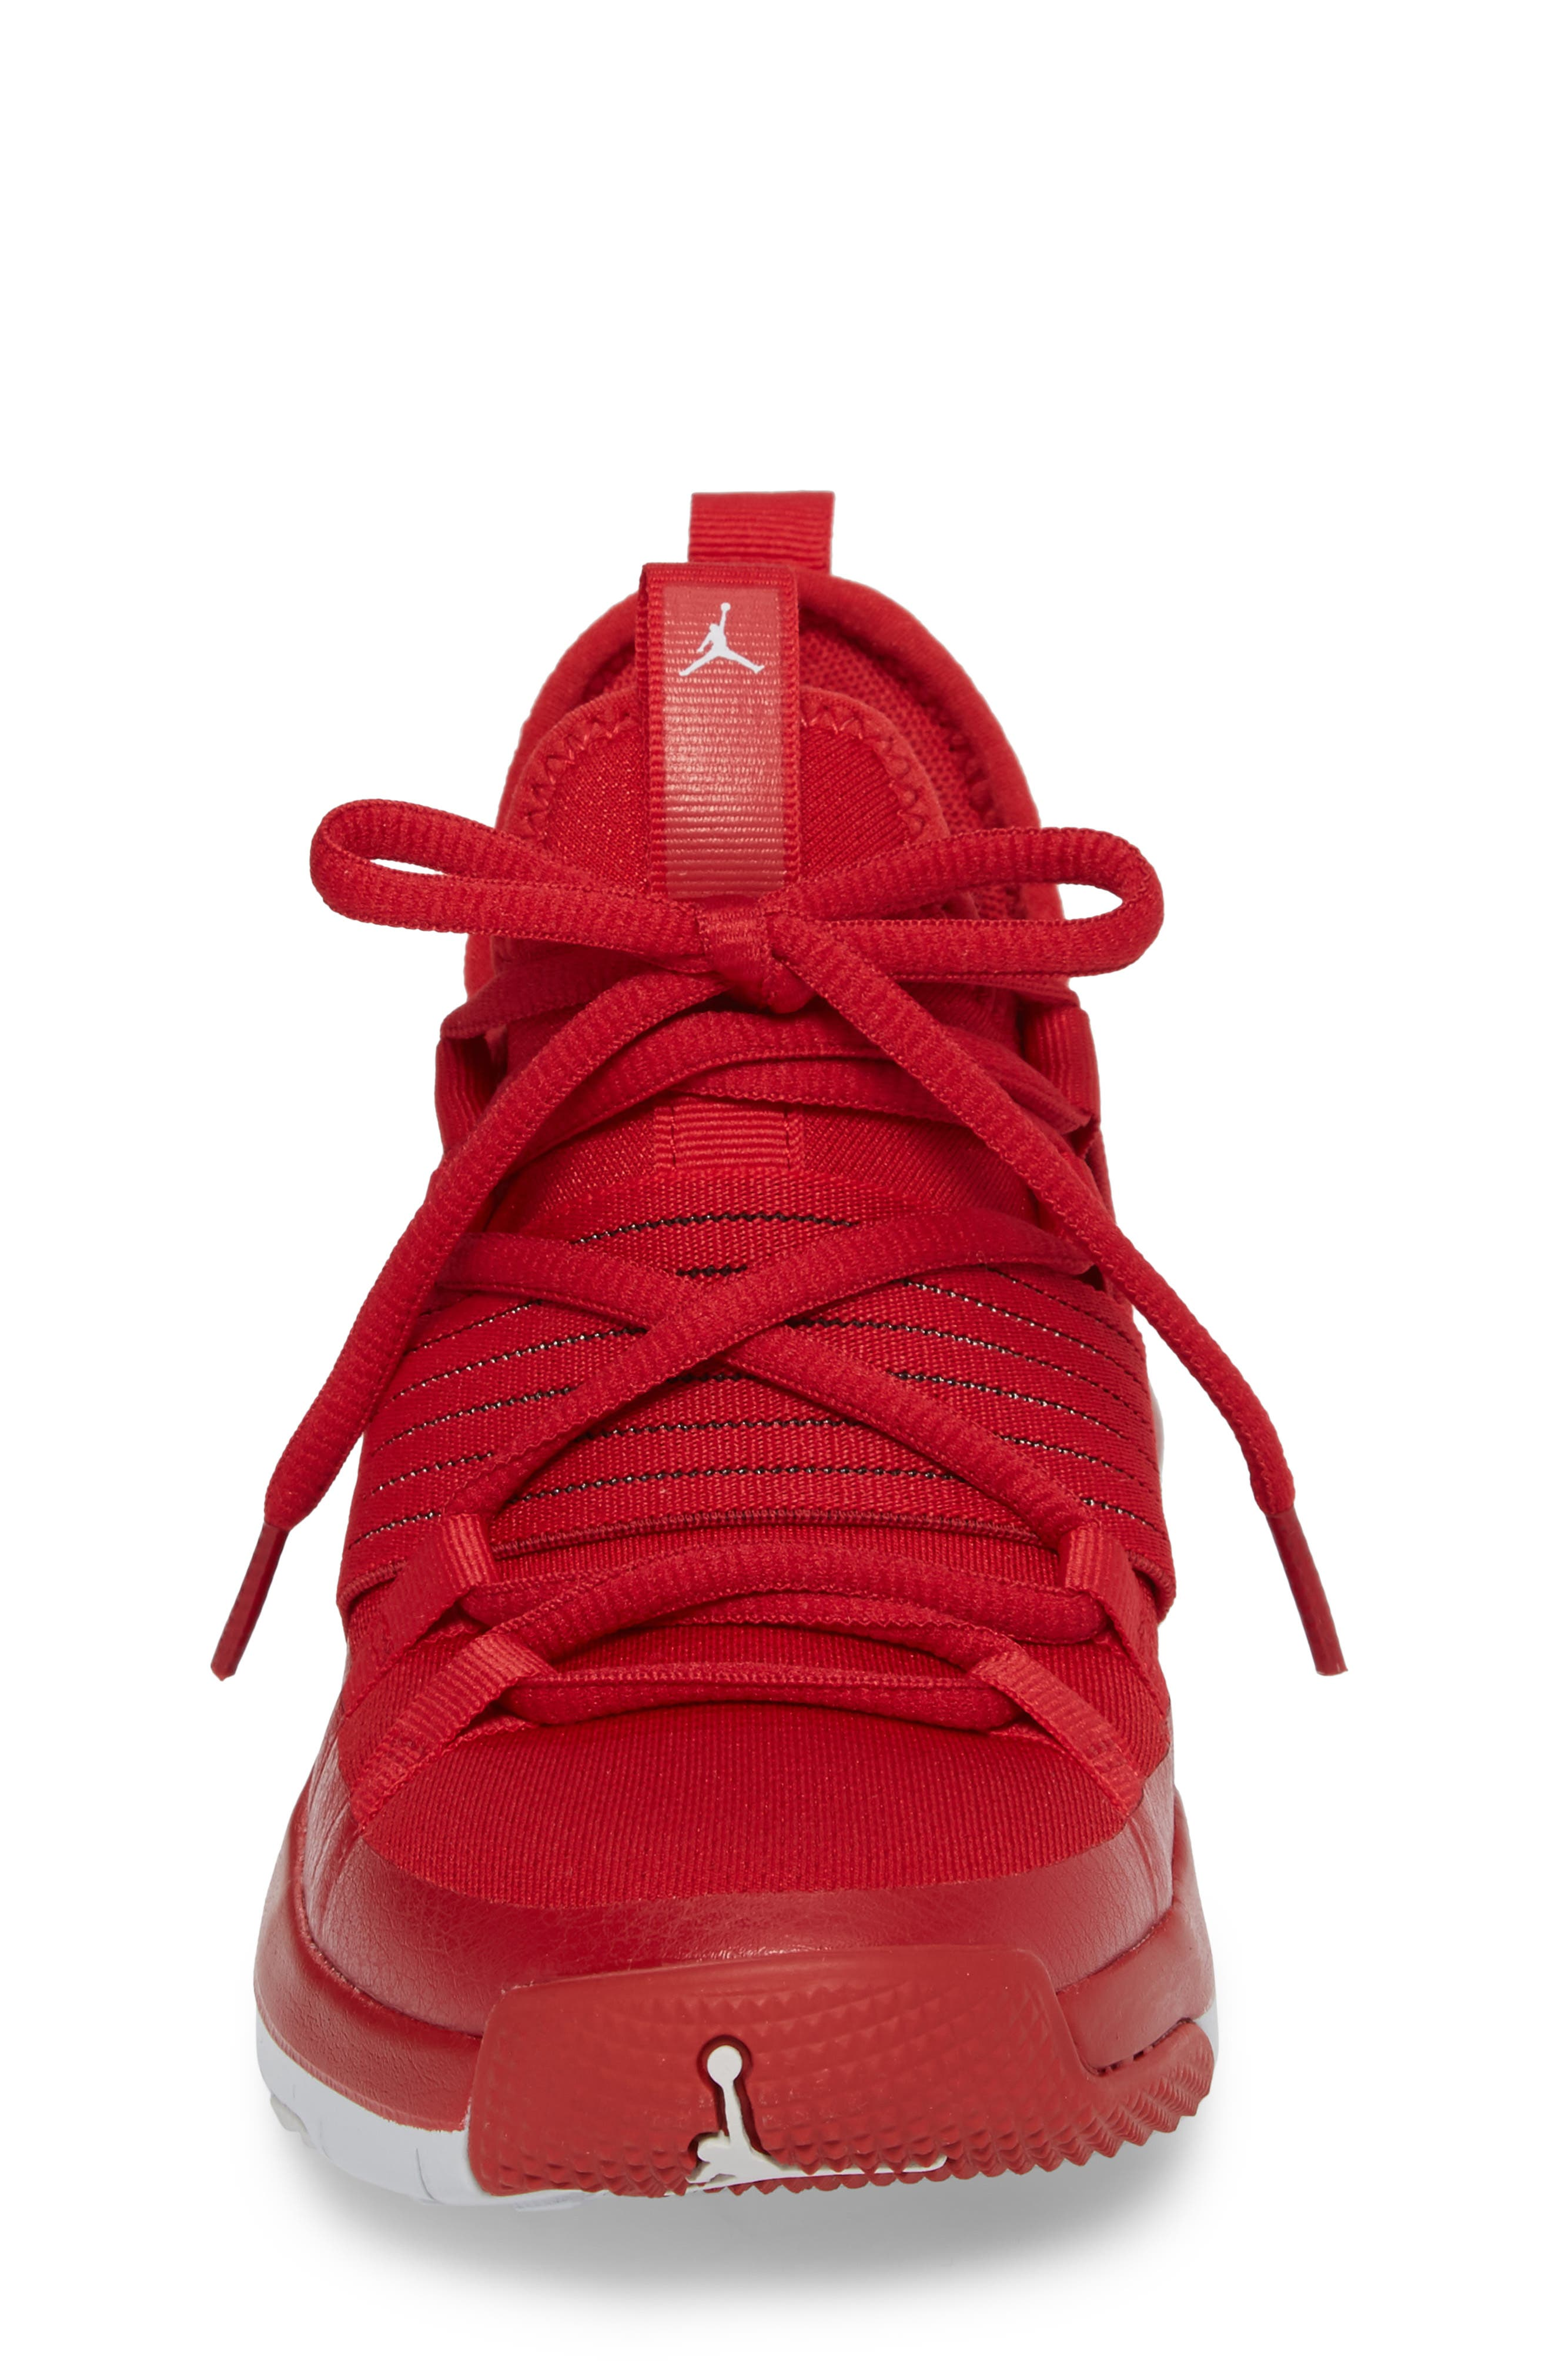 Trainer Pro Training Shoe,                             Alternate thumbnail 4, color,                             Gym Red/ Pure Platinum